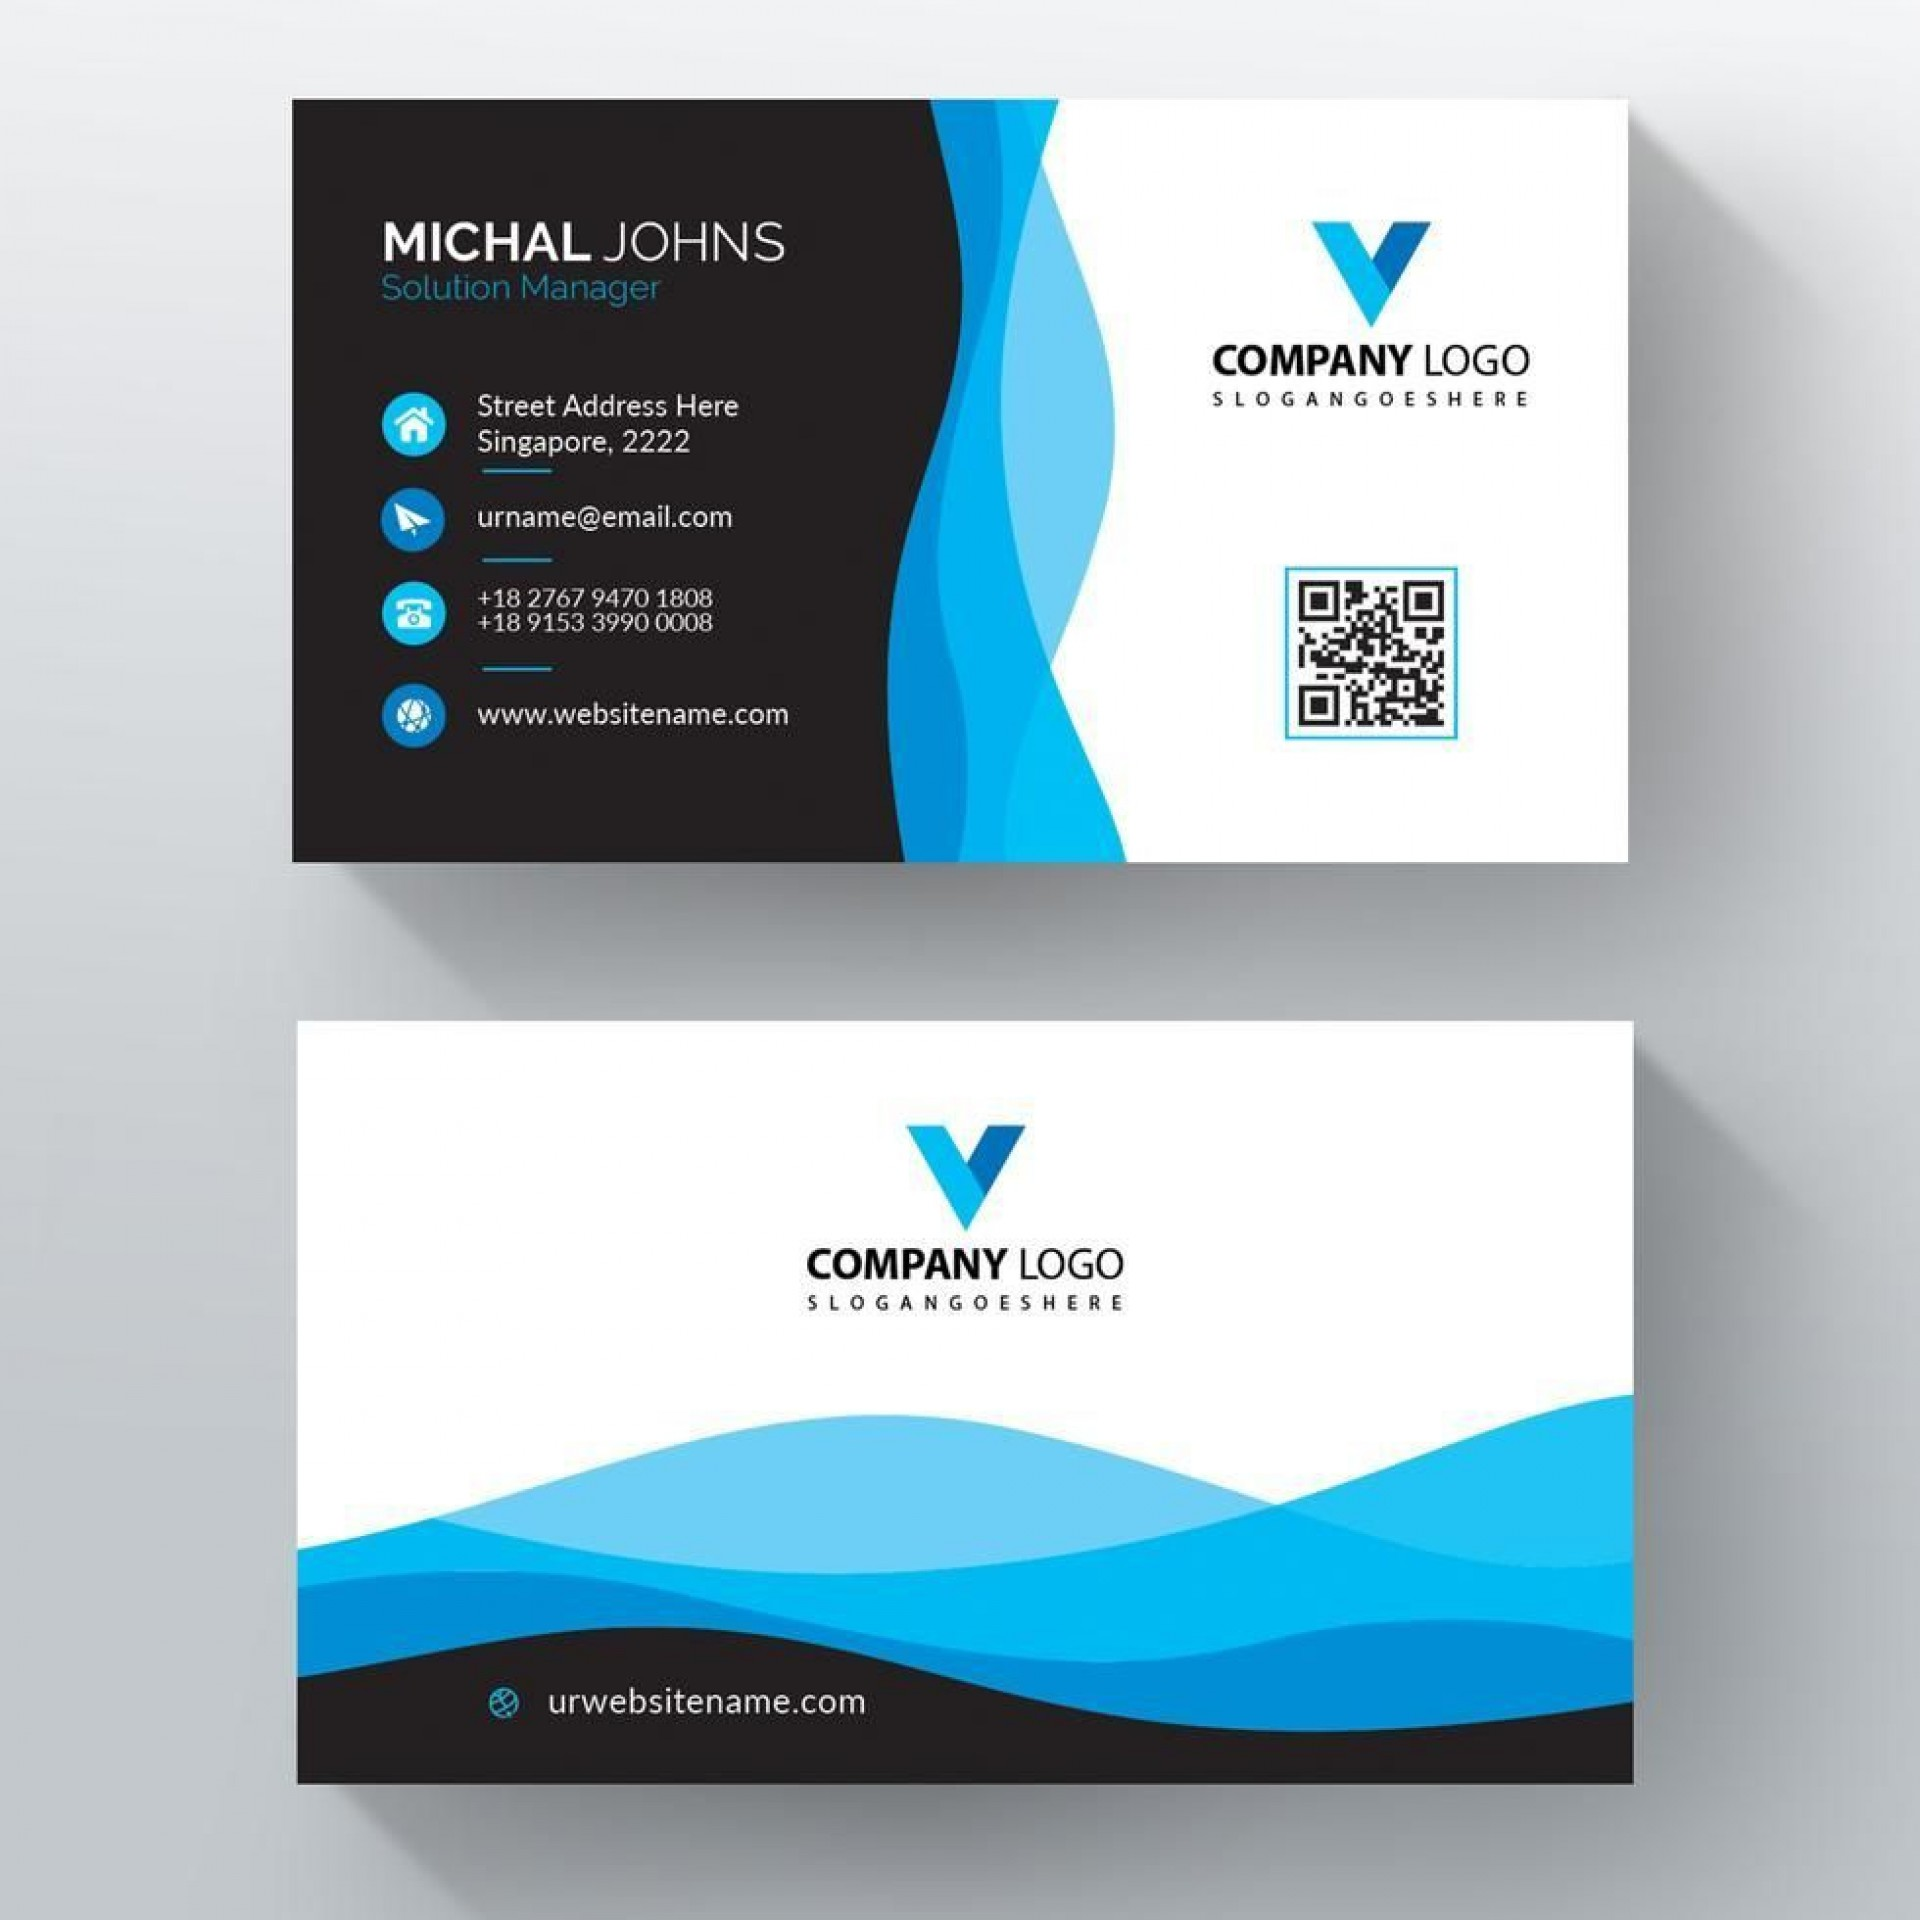 006 Striking Minimal Busines Card Template Free Download Idea  Simple Design Coreldraw1920